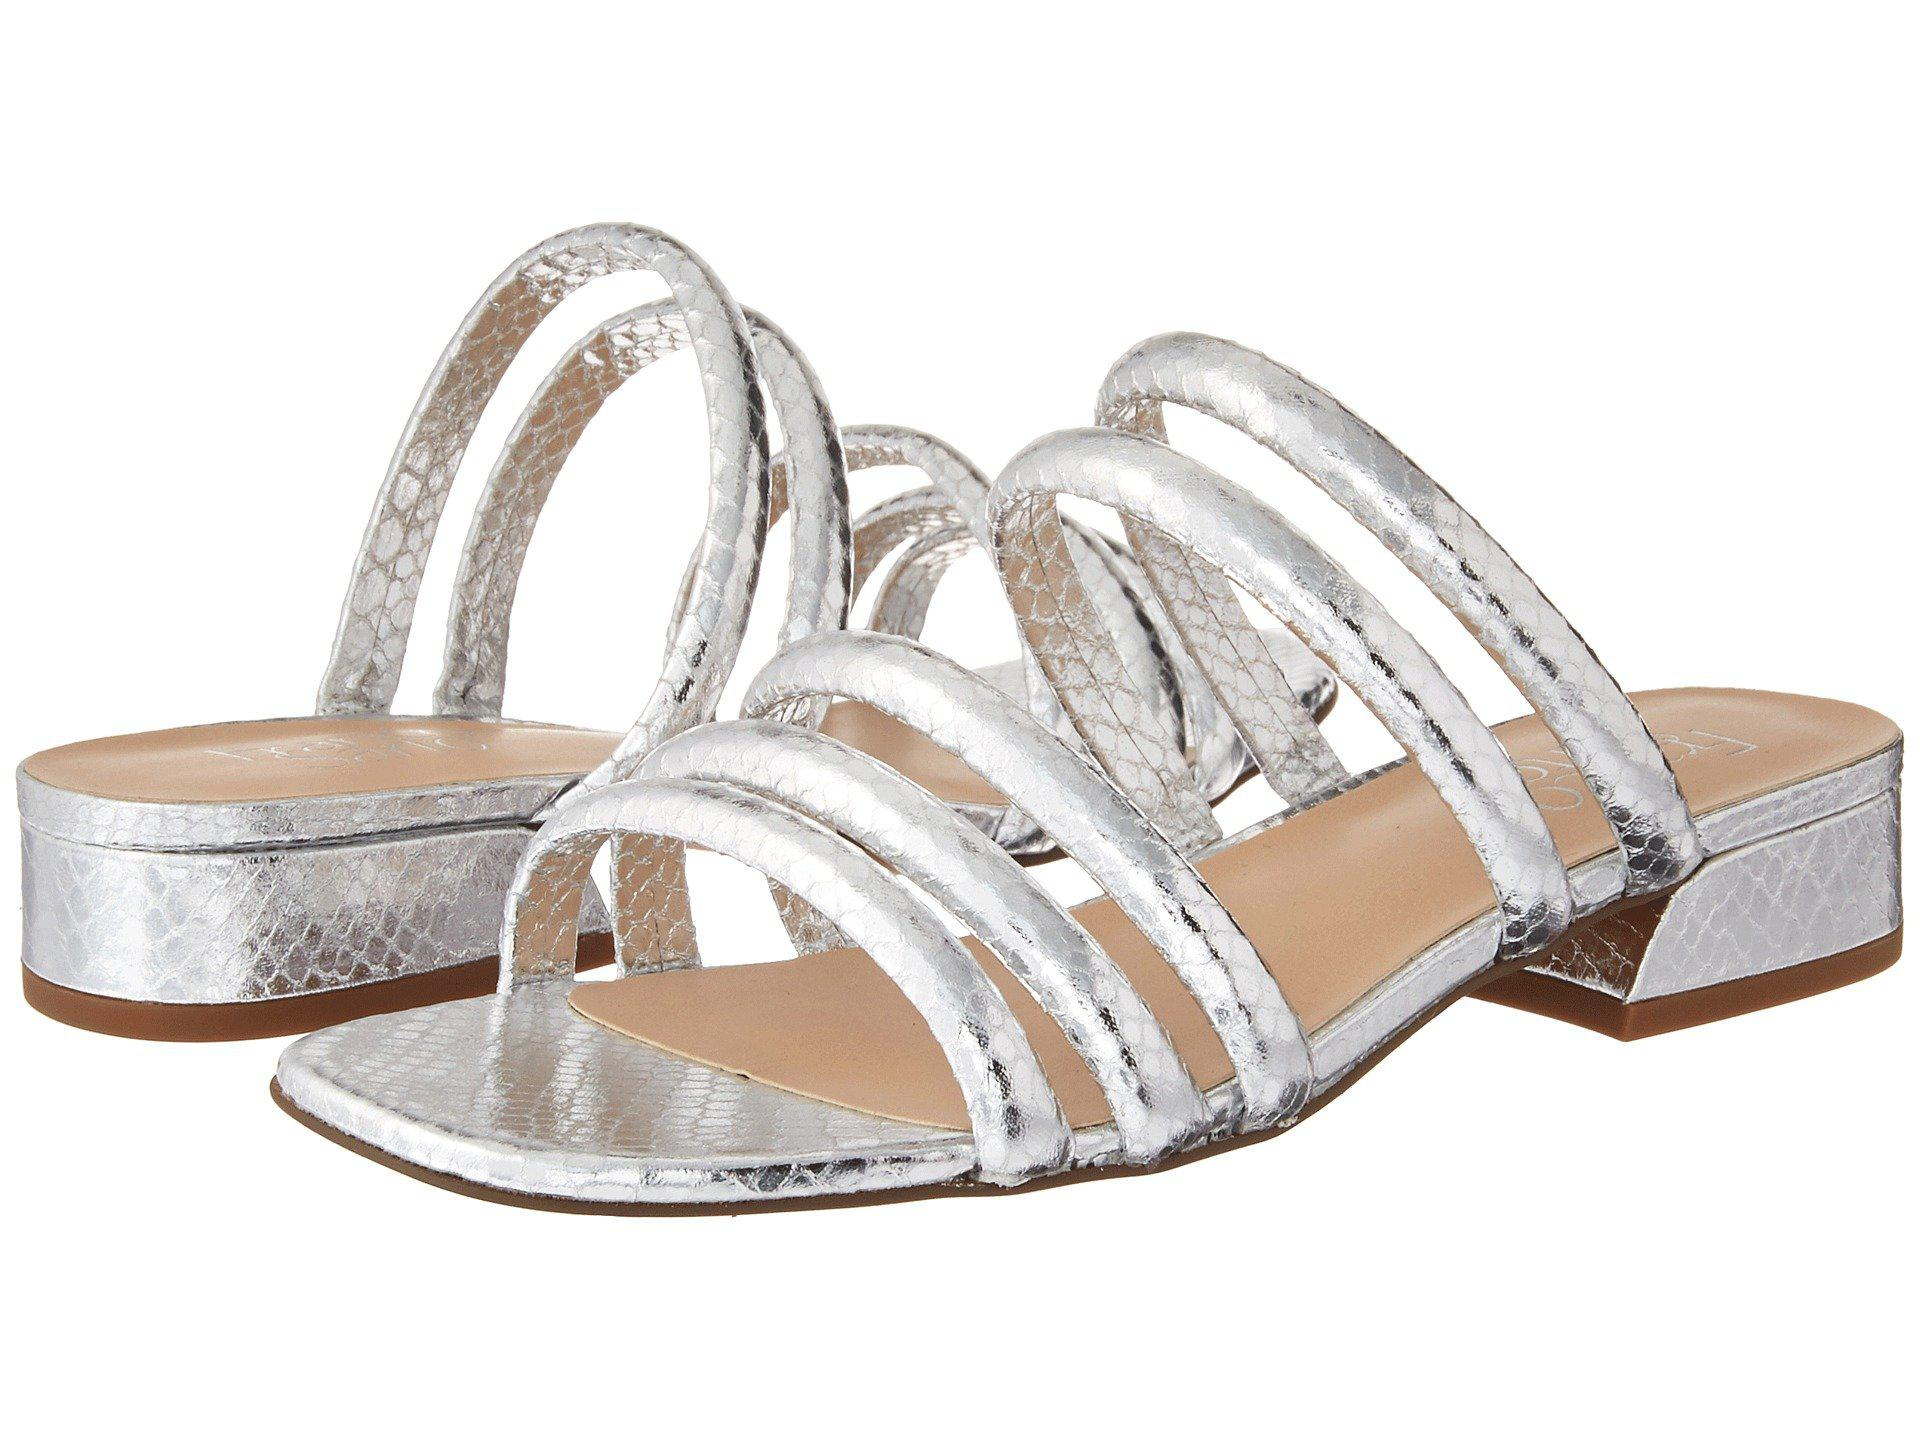 Franco Sarto Fitz Metallic Shiny Snake Print Block Heel Slide Sandals Tvd6fSFf